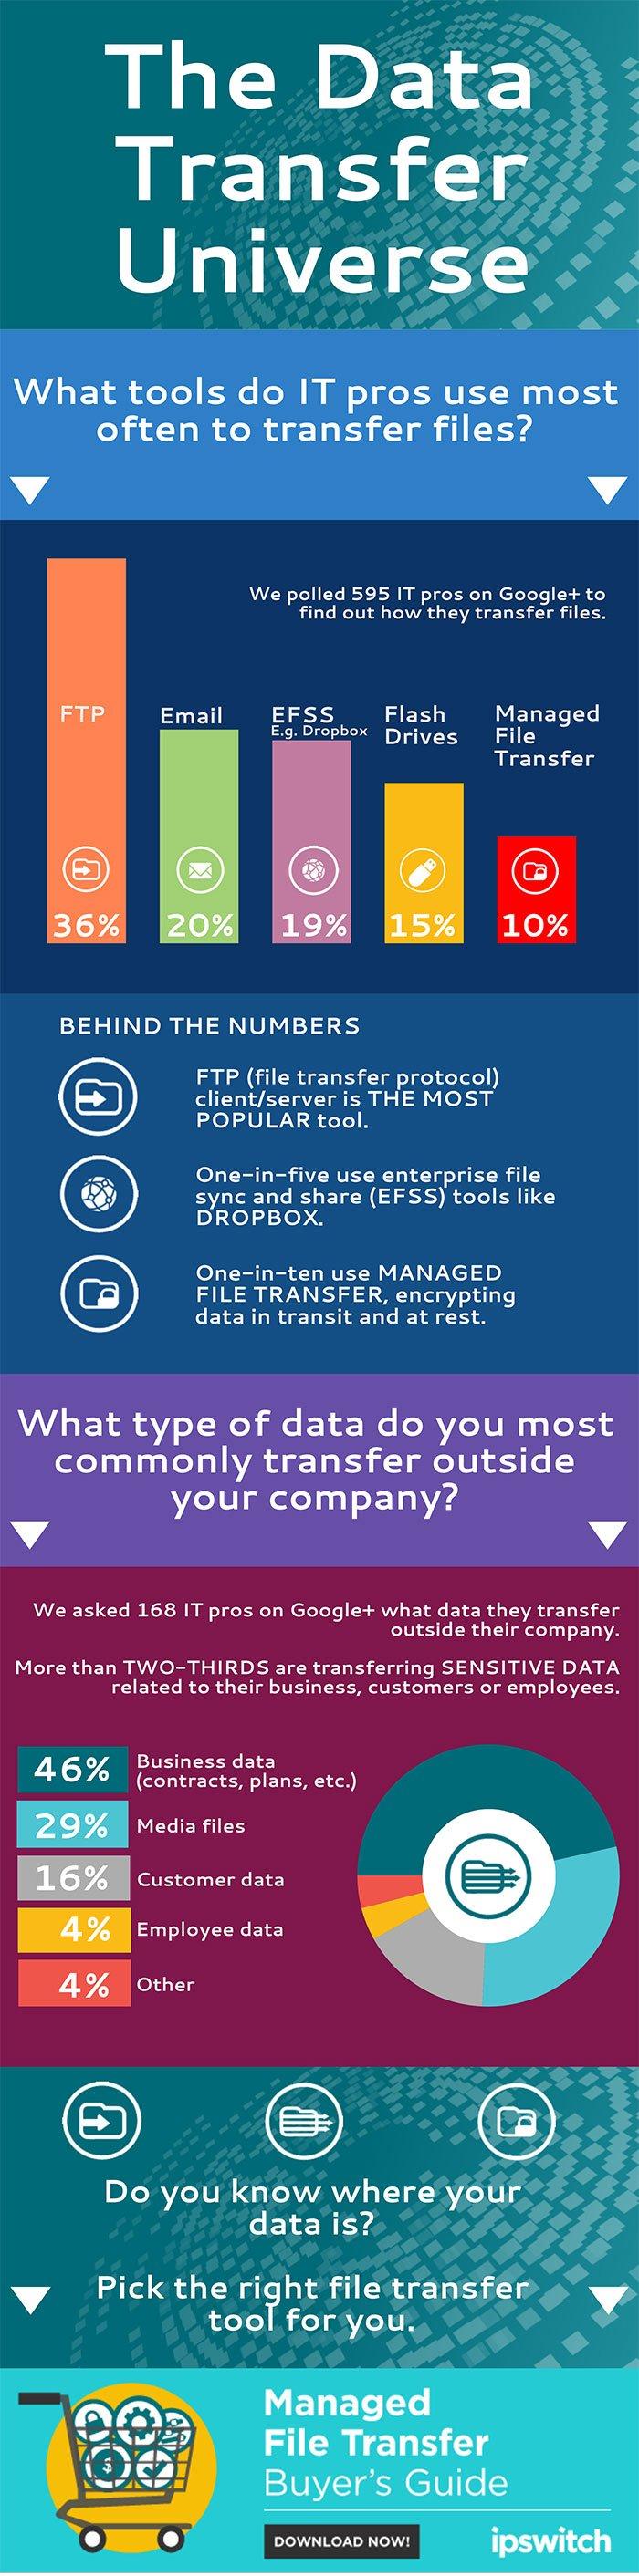 Data-Transfer-Universe-infographic_Apr-2016-(1)